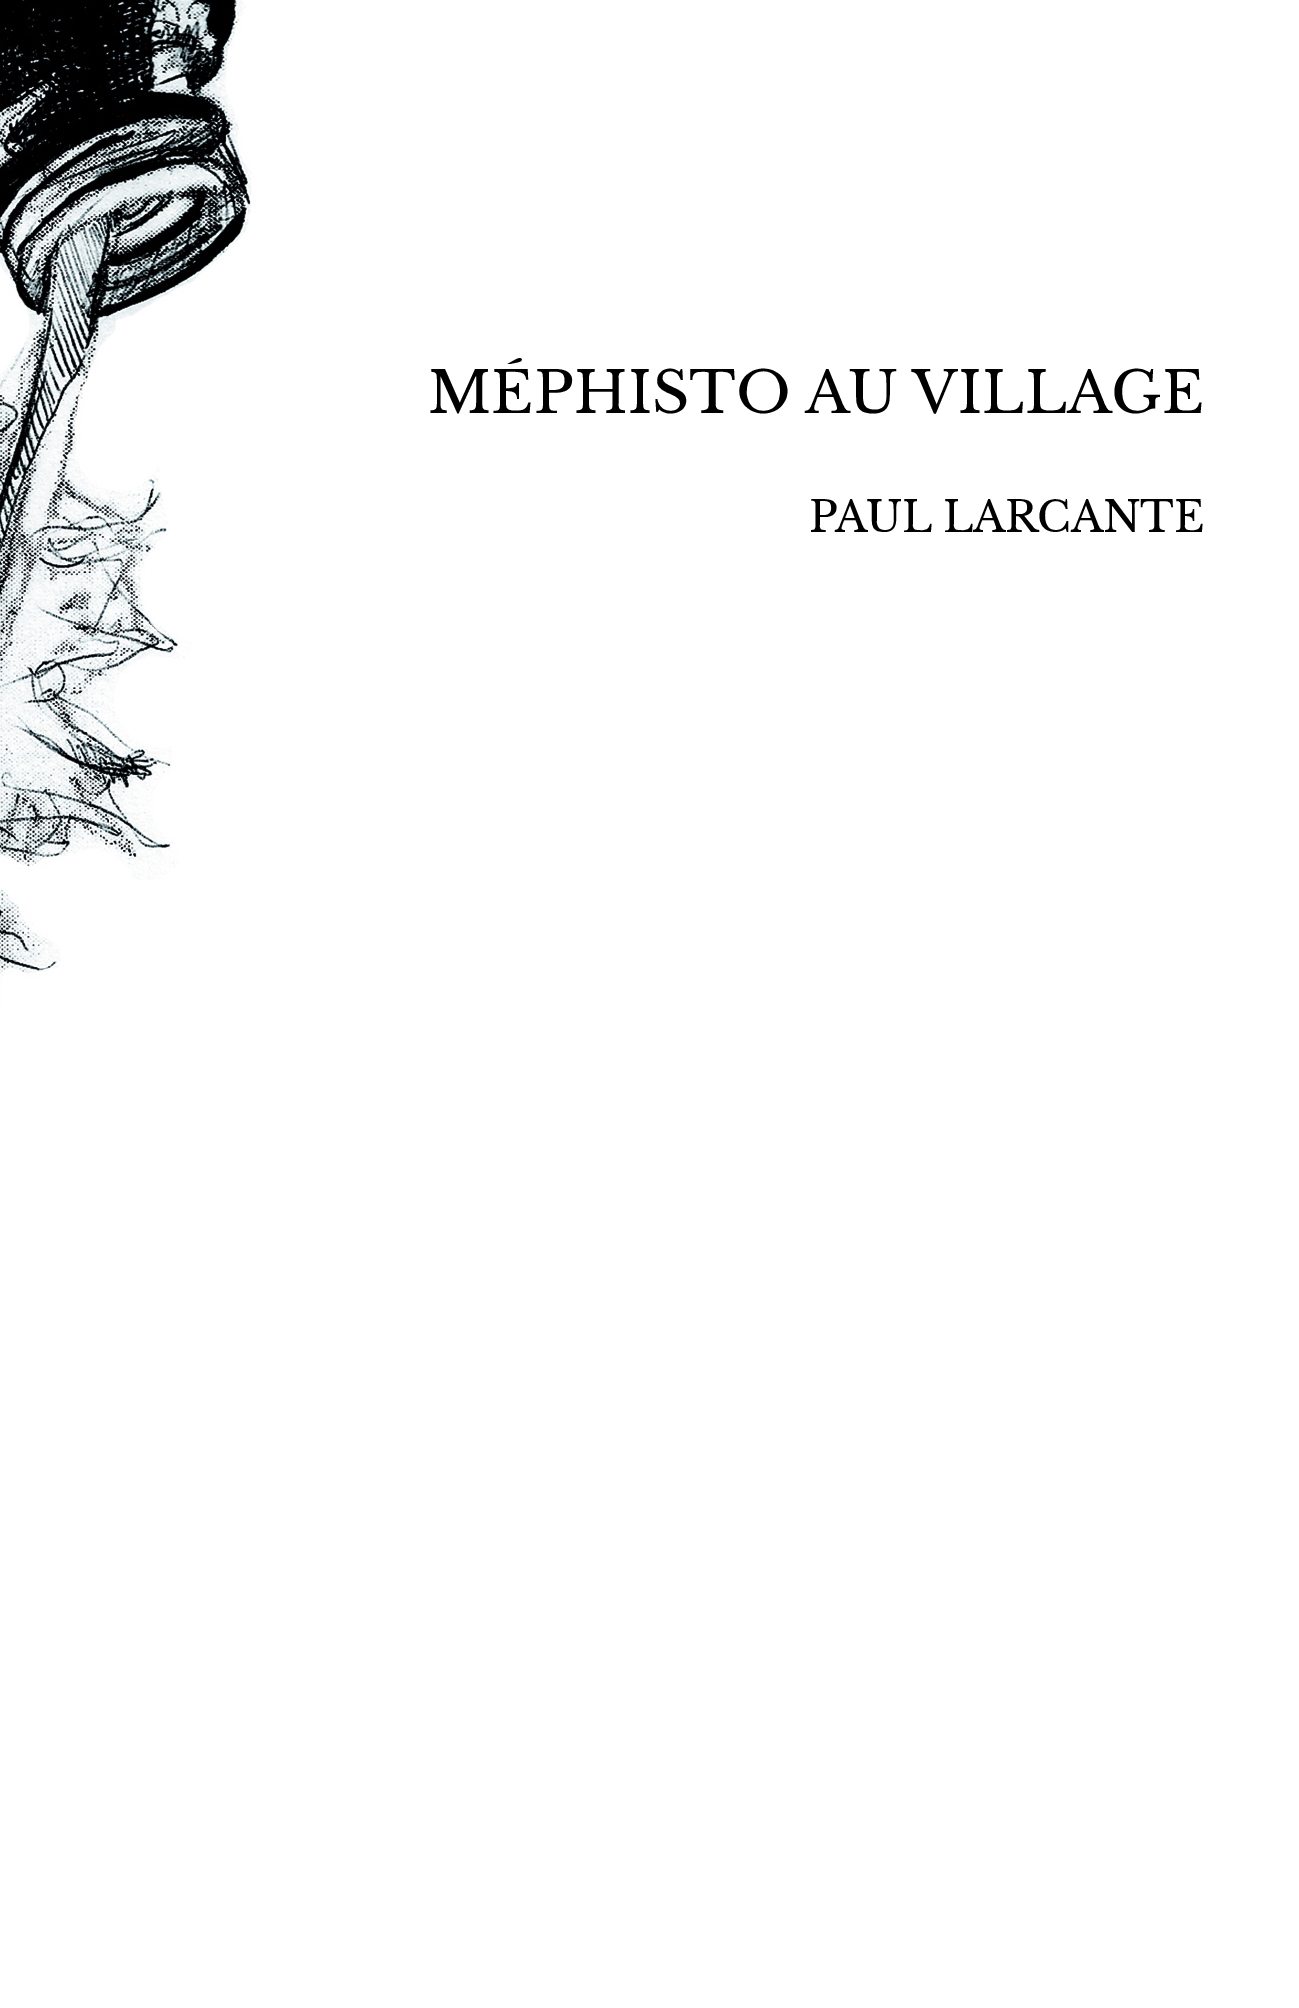 MÉPHISTO AU VILLAGE